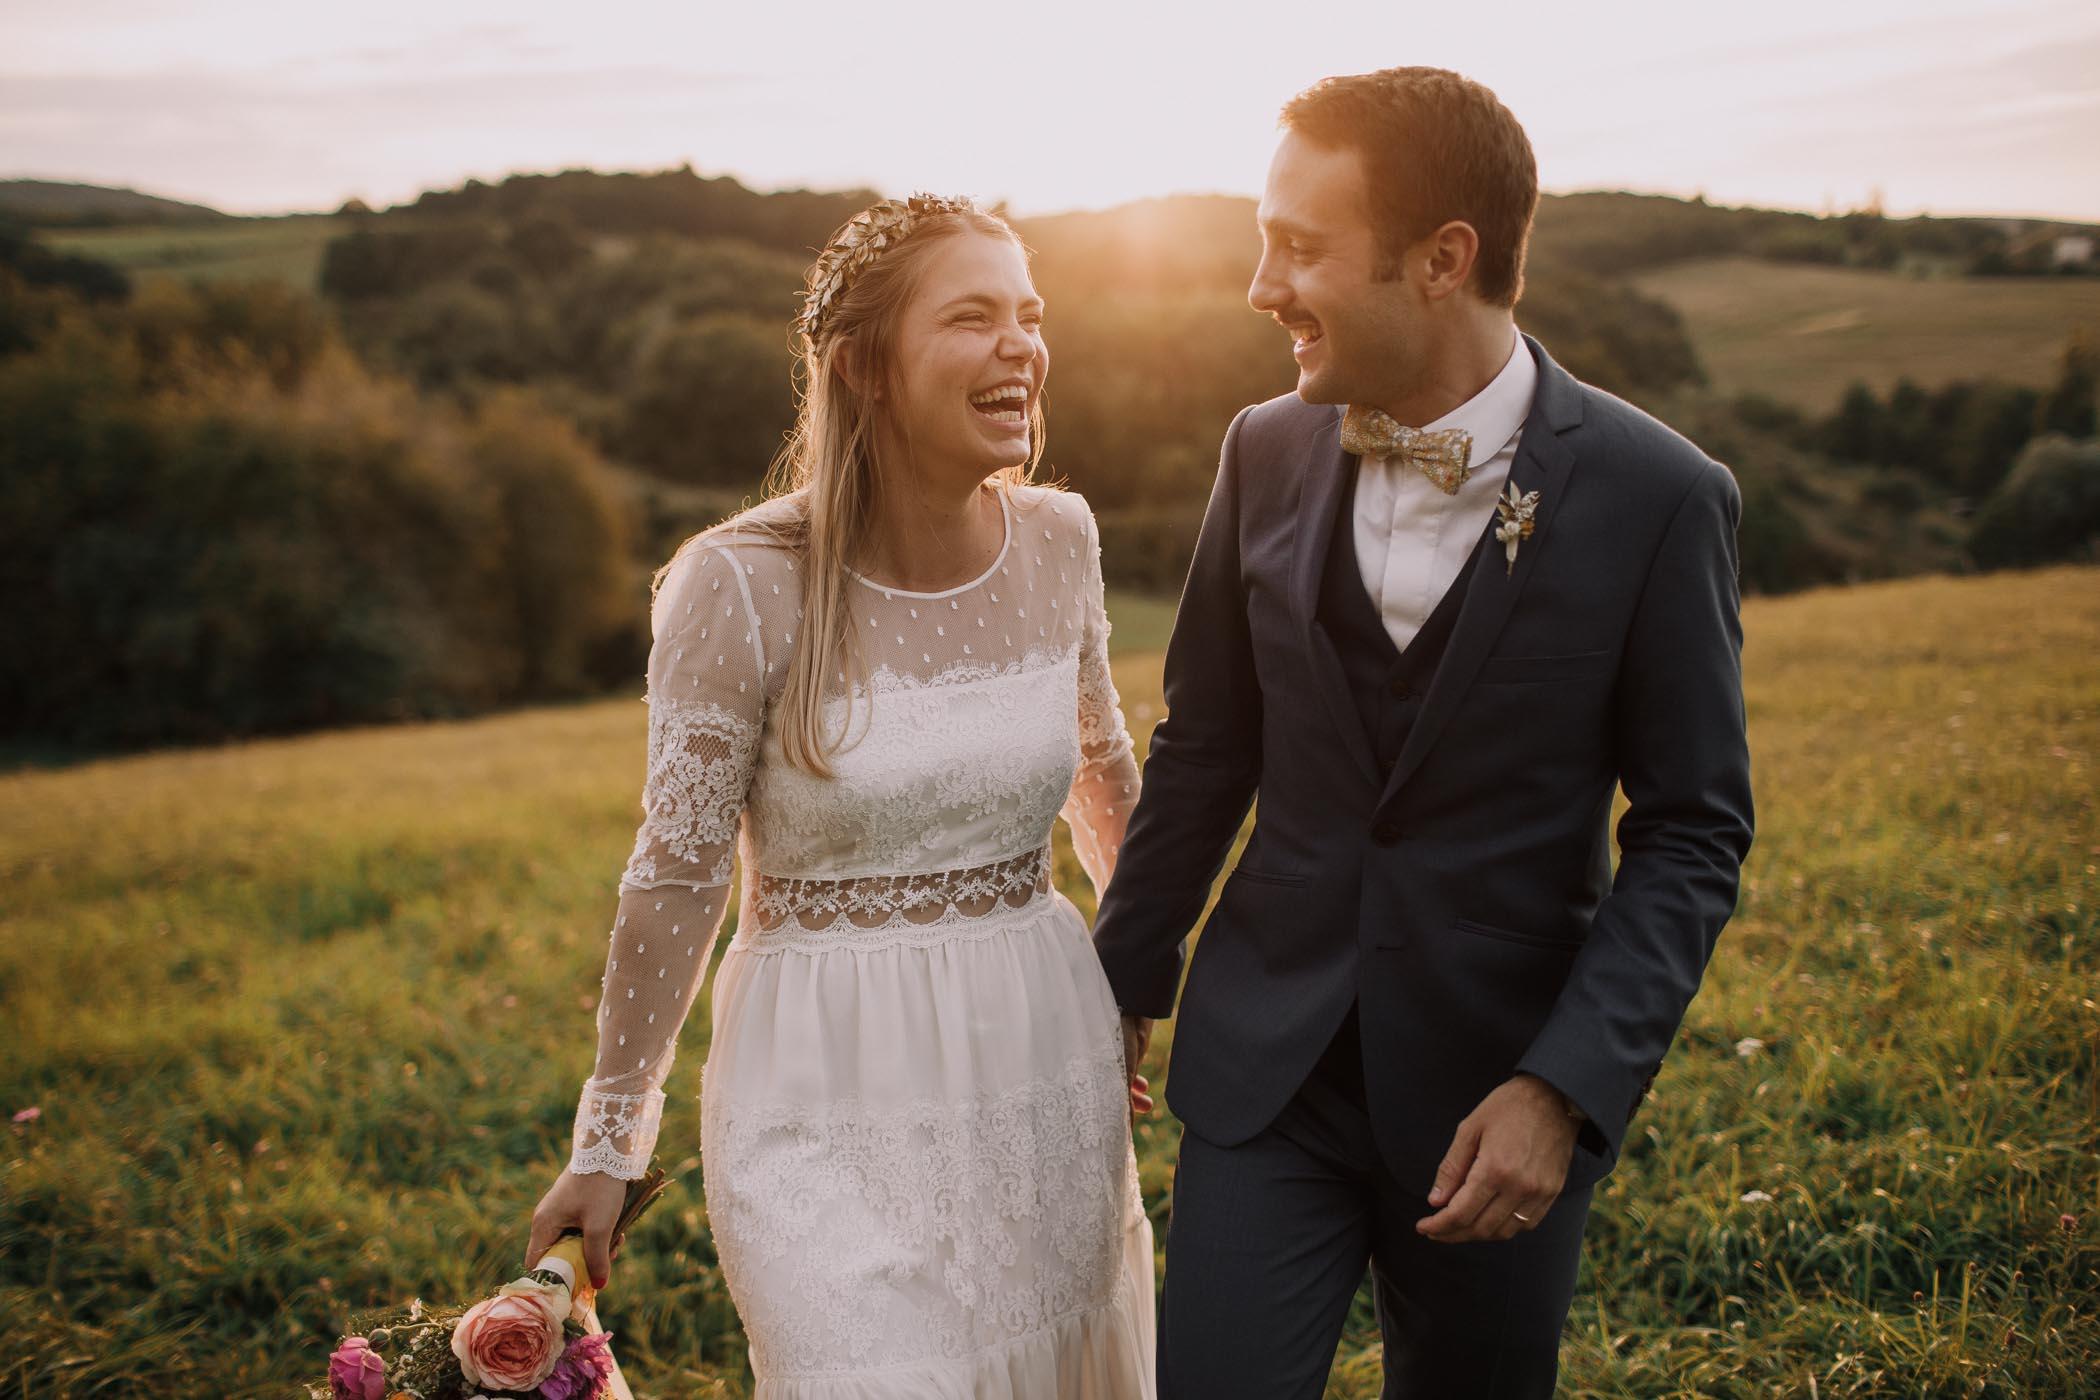 Photographe-mariage-bordeaux-jeremy-boyer-28.jpg